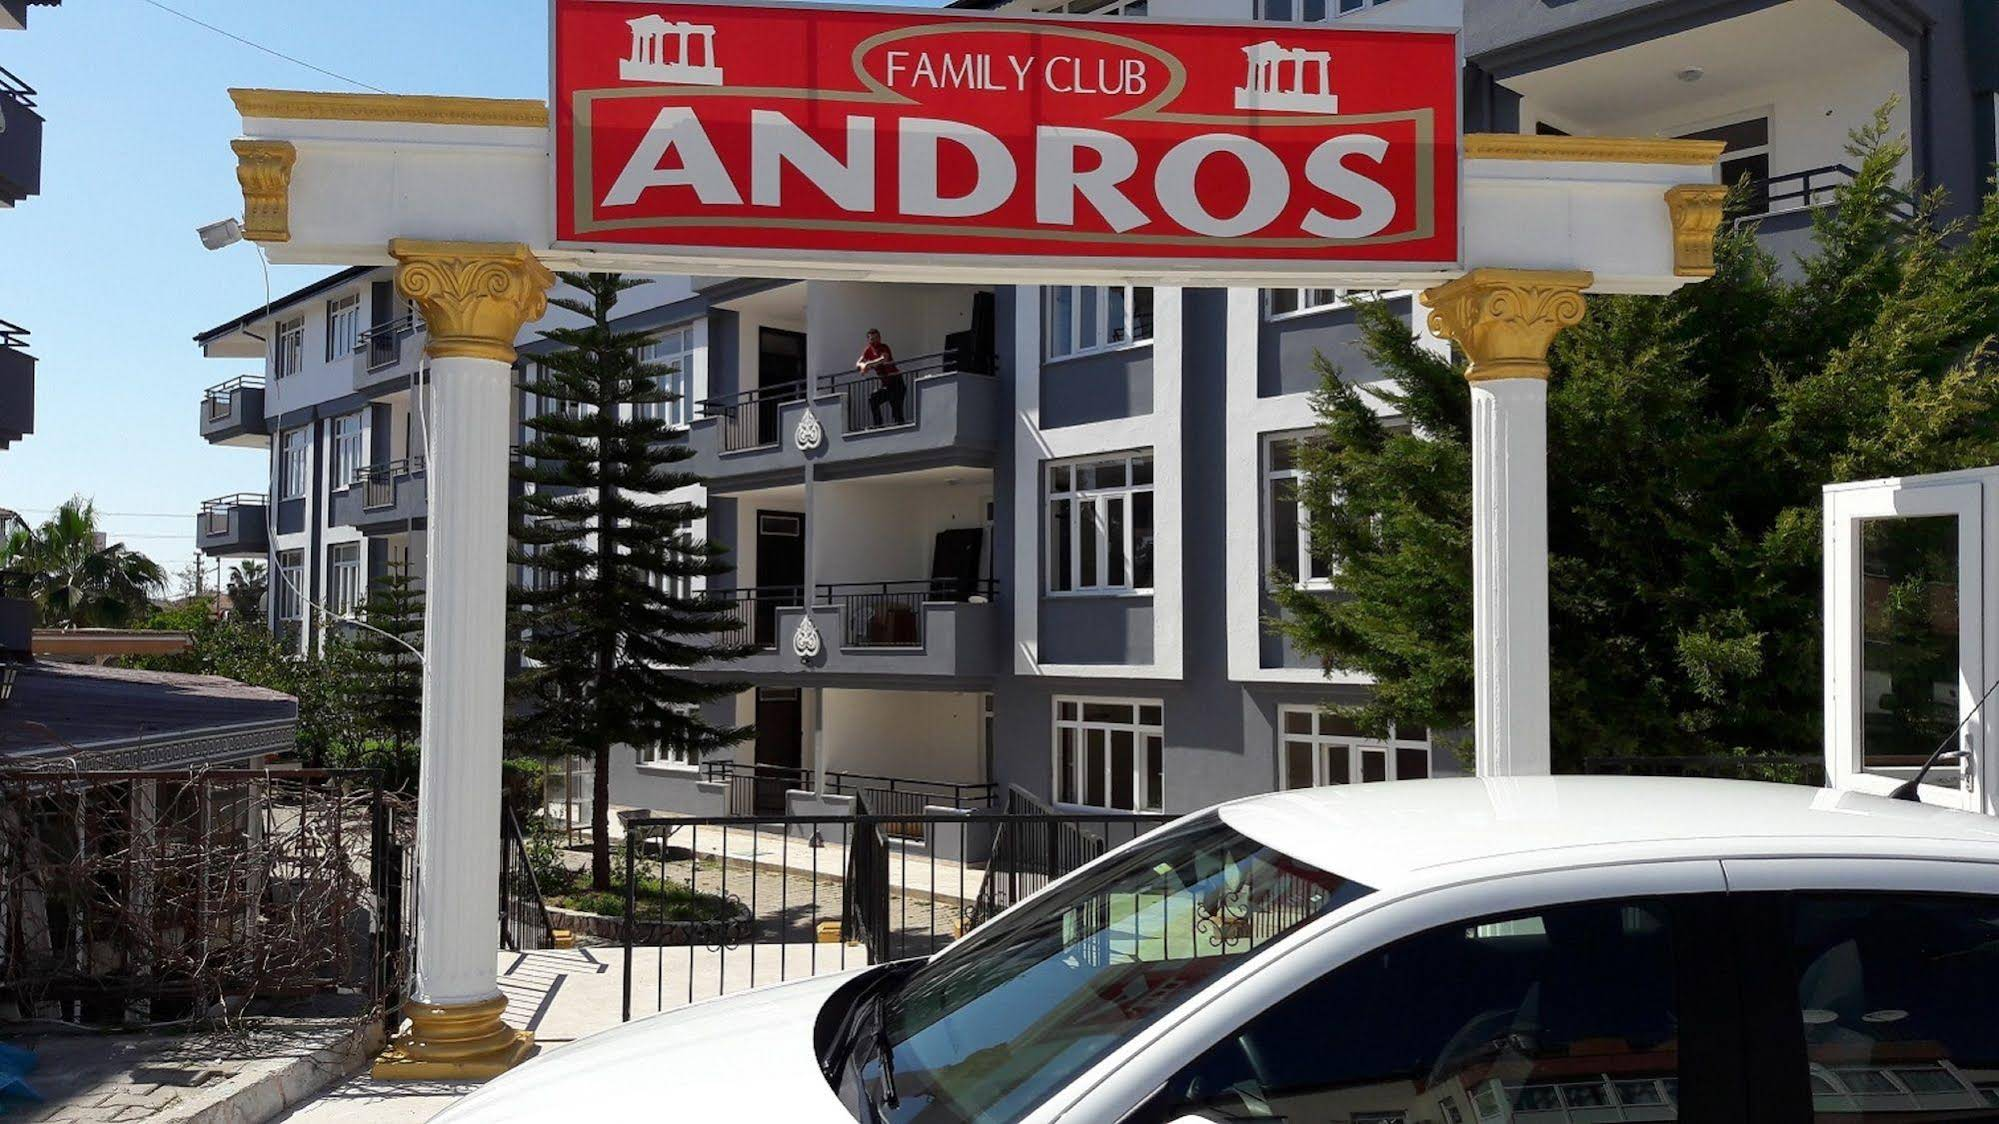 Andros Family Club